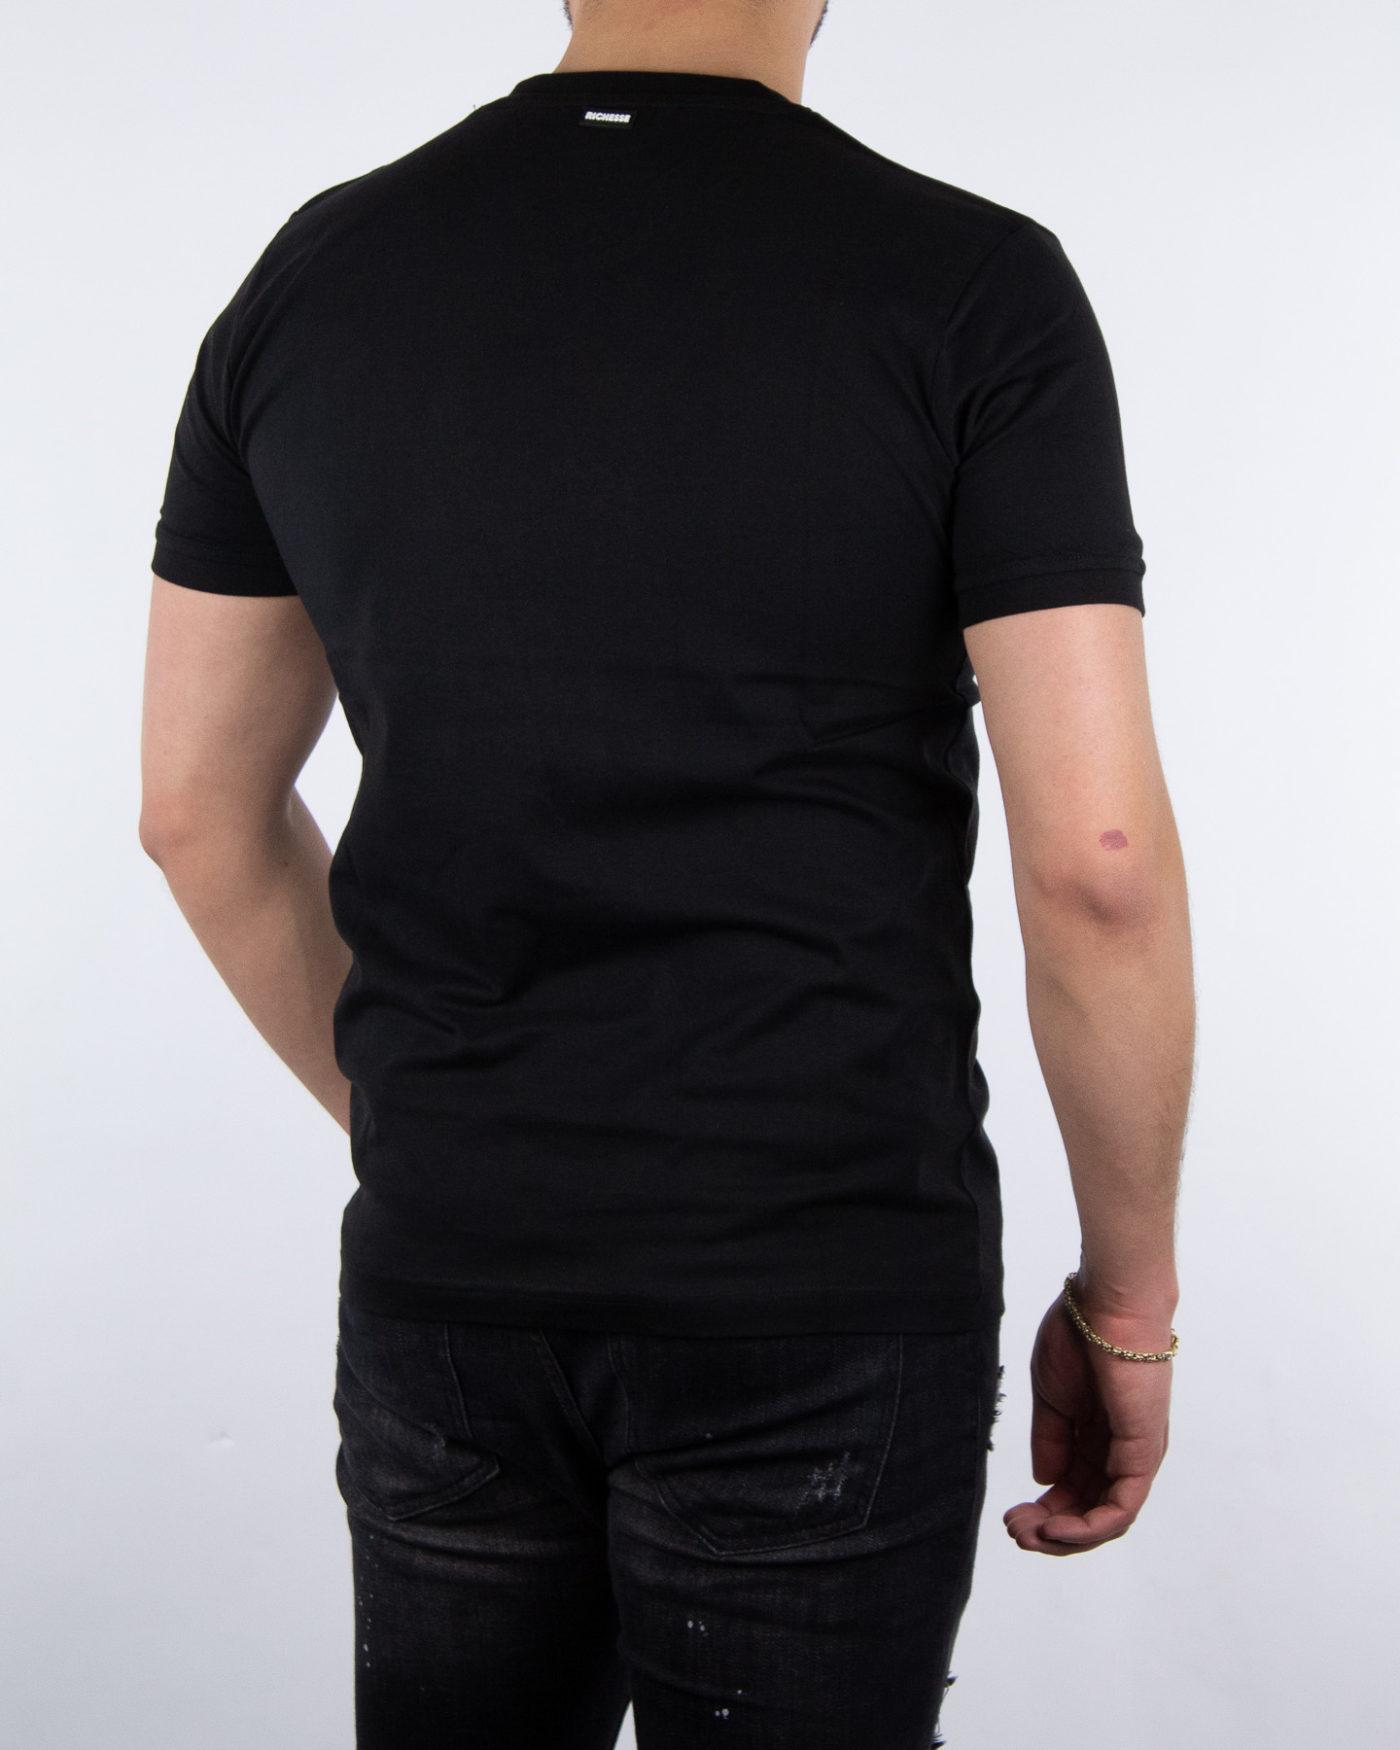 Jordan Black T-shirt-2